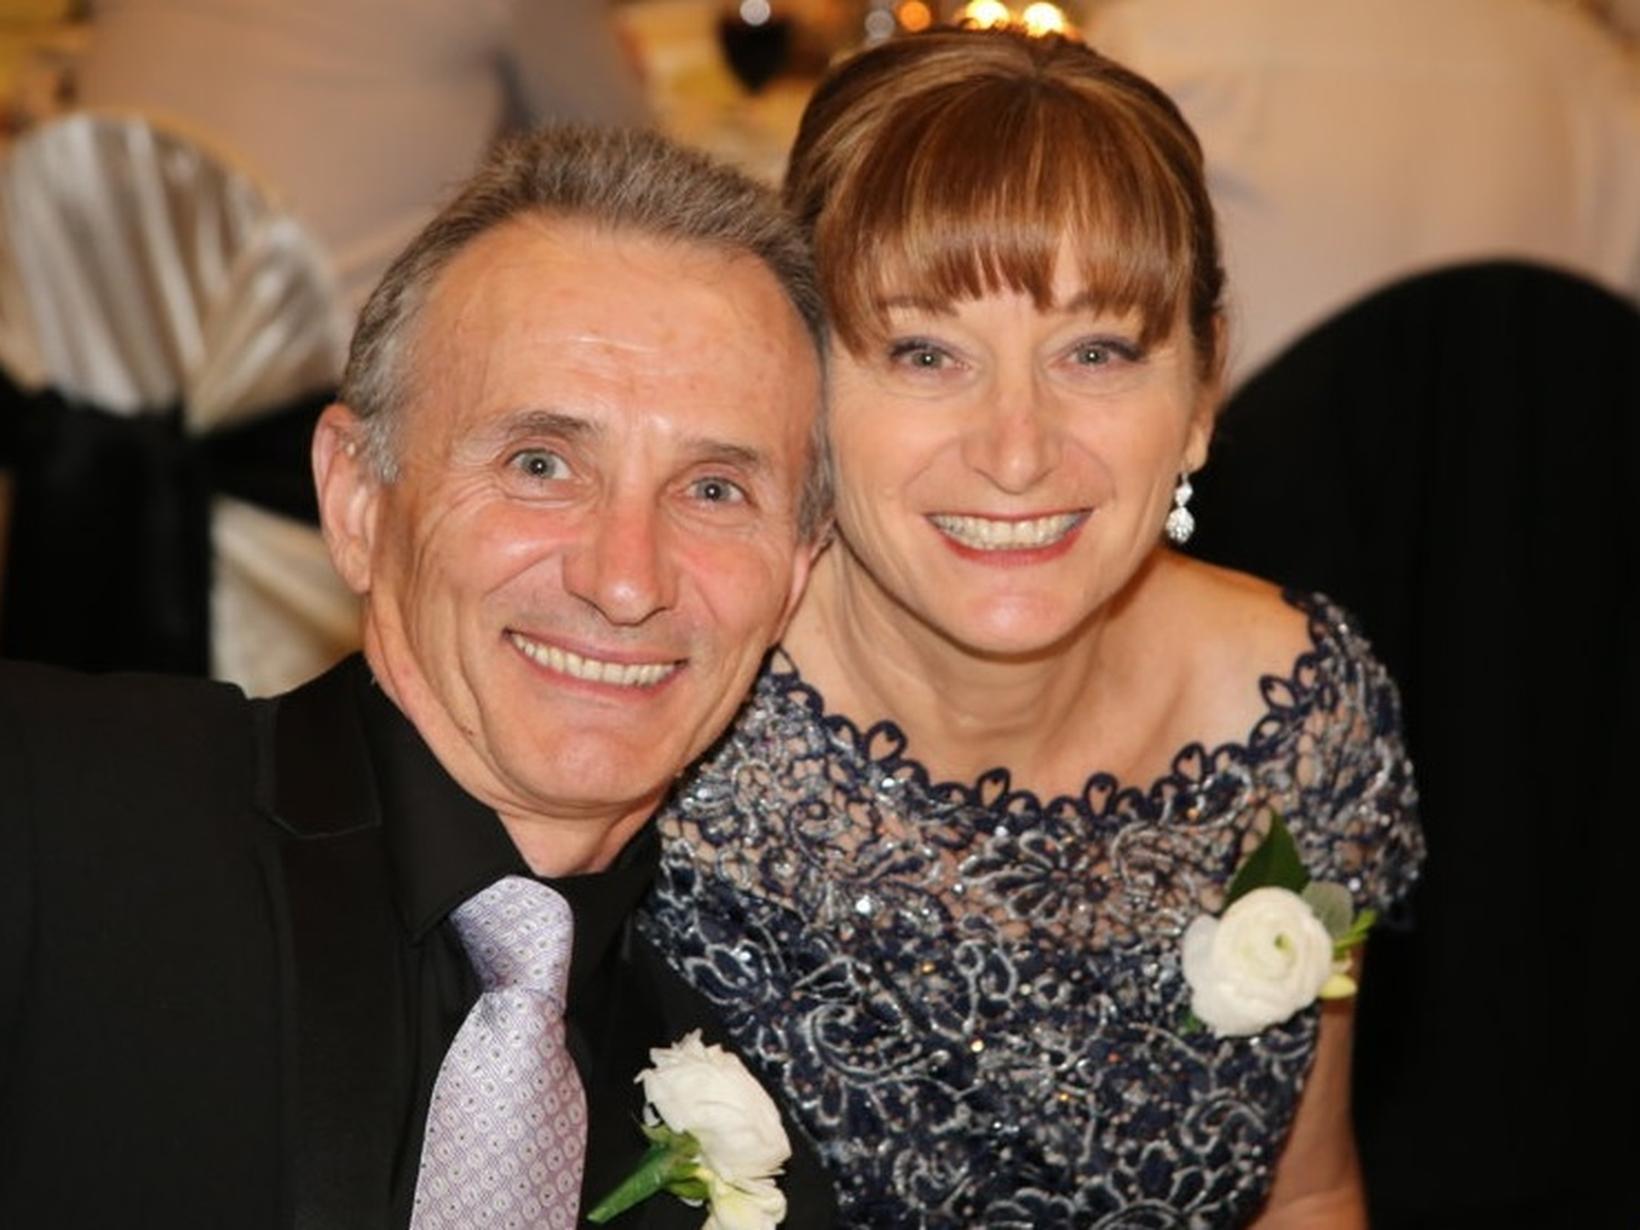 Karen & John from Townsville, Queensland, Australia